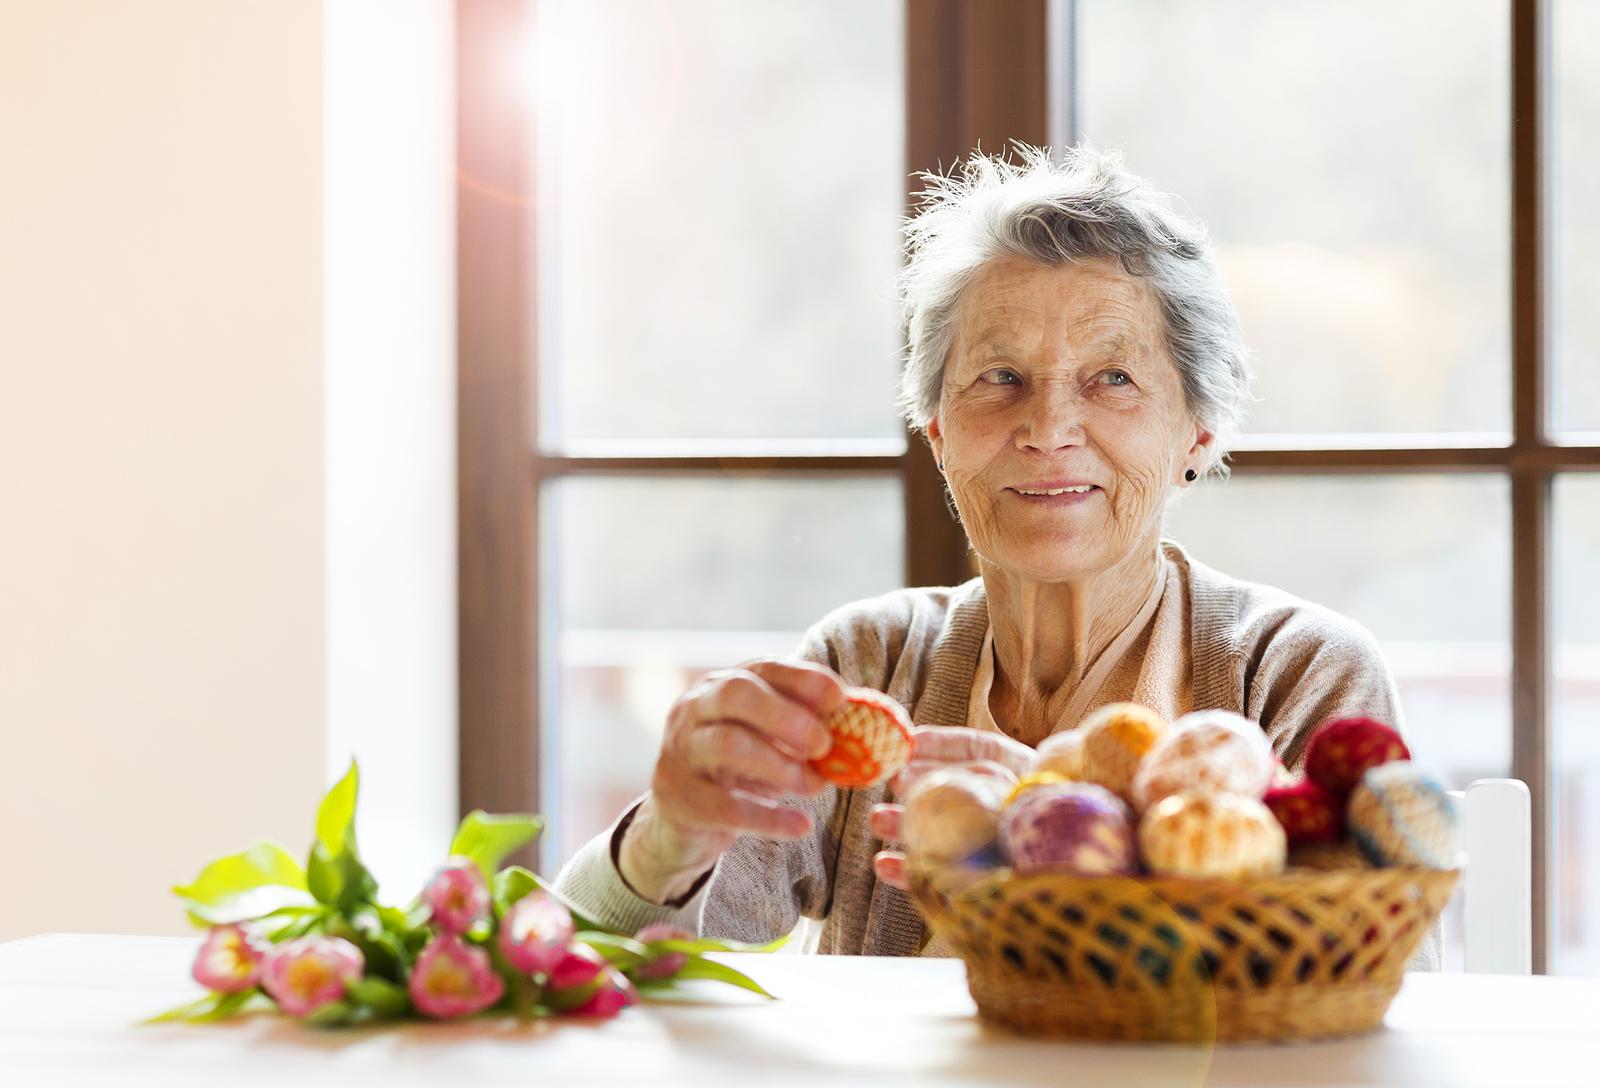 Easter Activities For Seniors In Retirement Homes